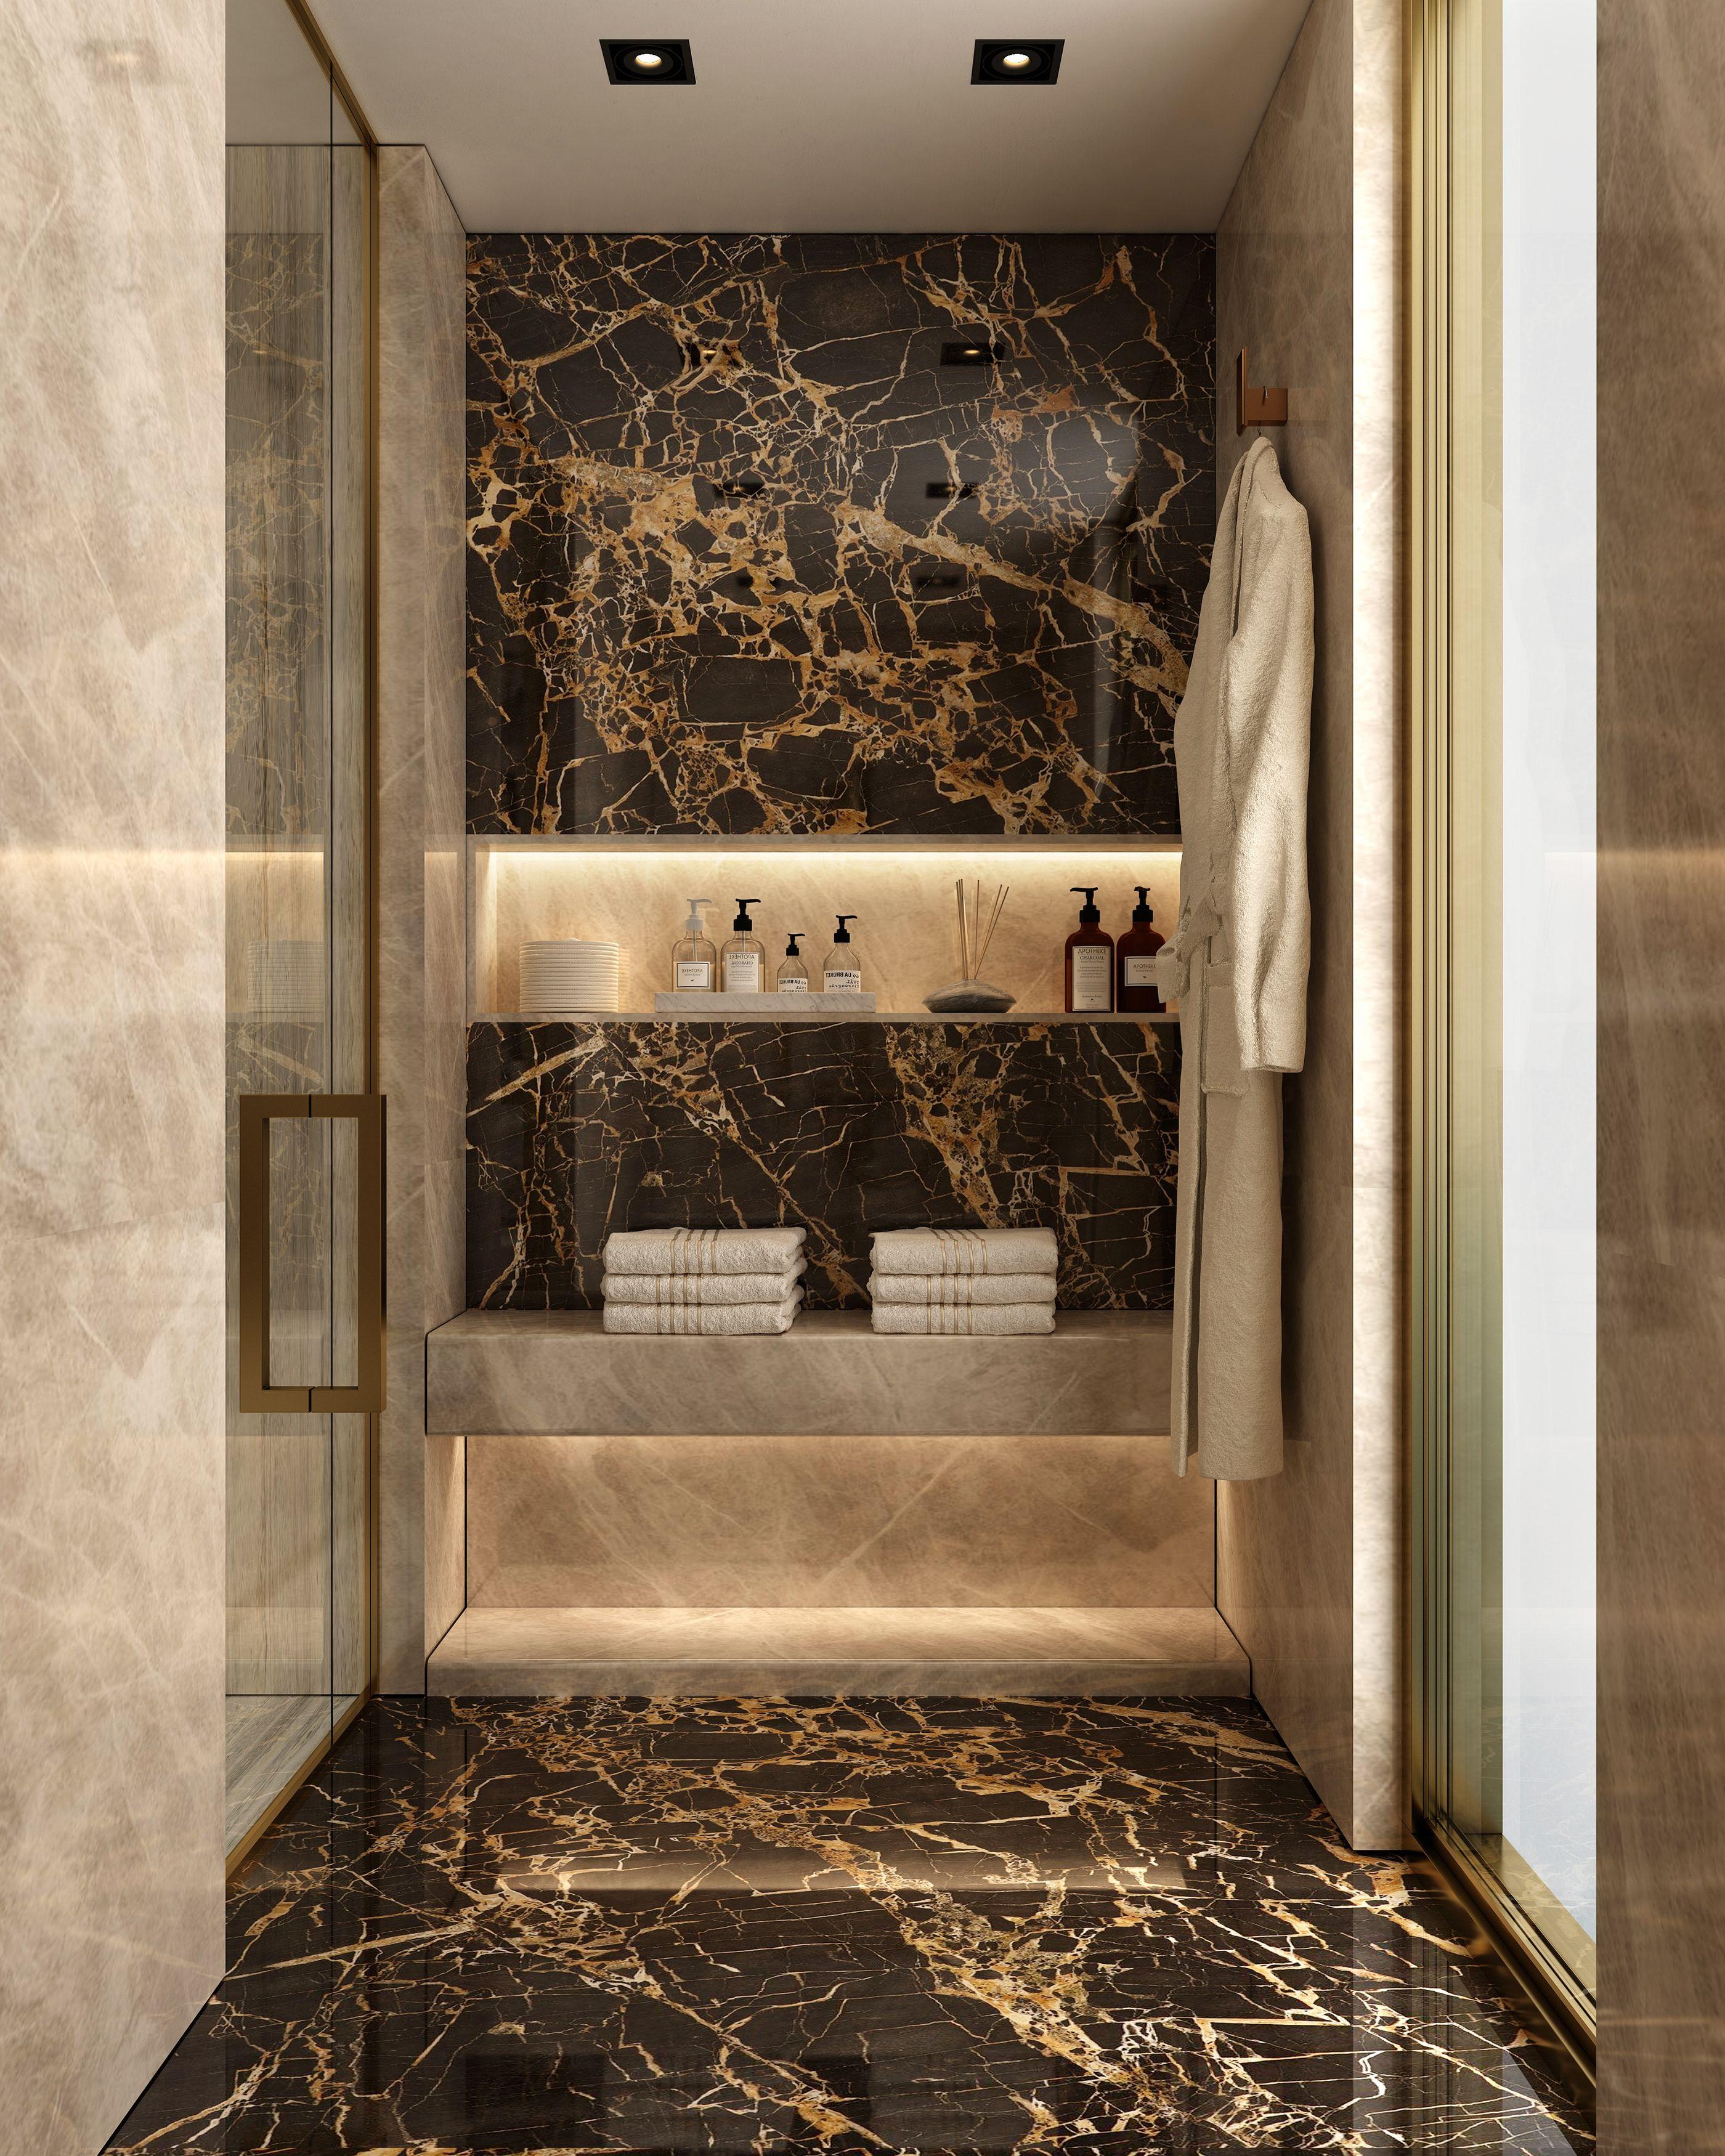 Incredible Bathroom Ideas Luxurious Bathroom Interior Frame House Www Ardahus Lt En Karkasi Bathroom Inspiration Modern Glamorous Bathroom Luxury Bathroom